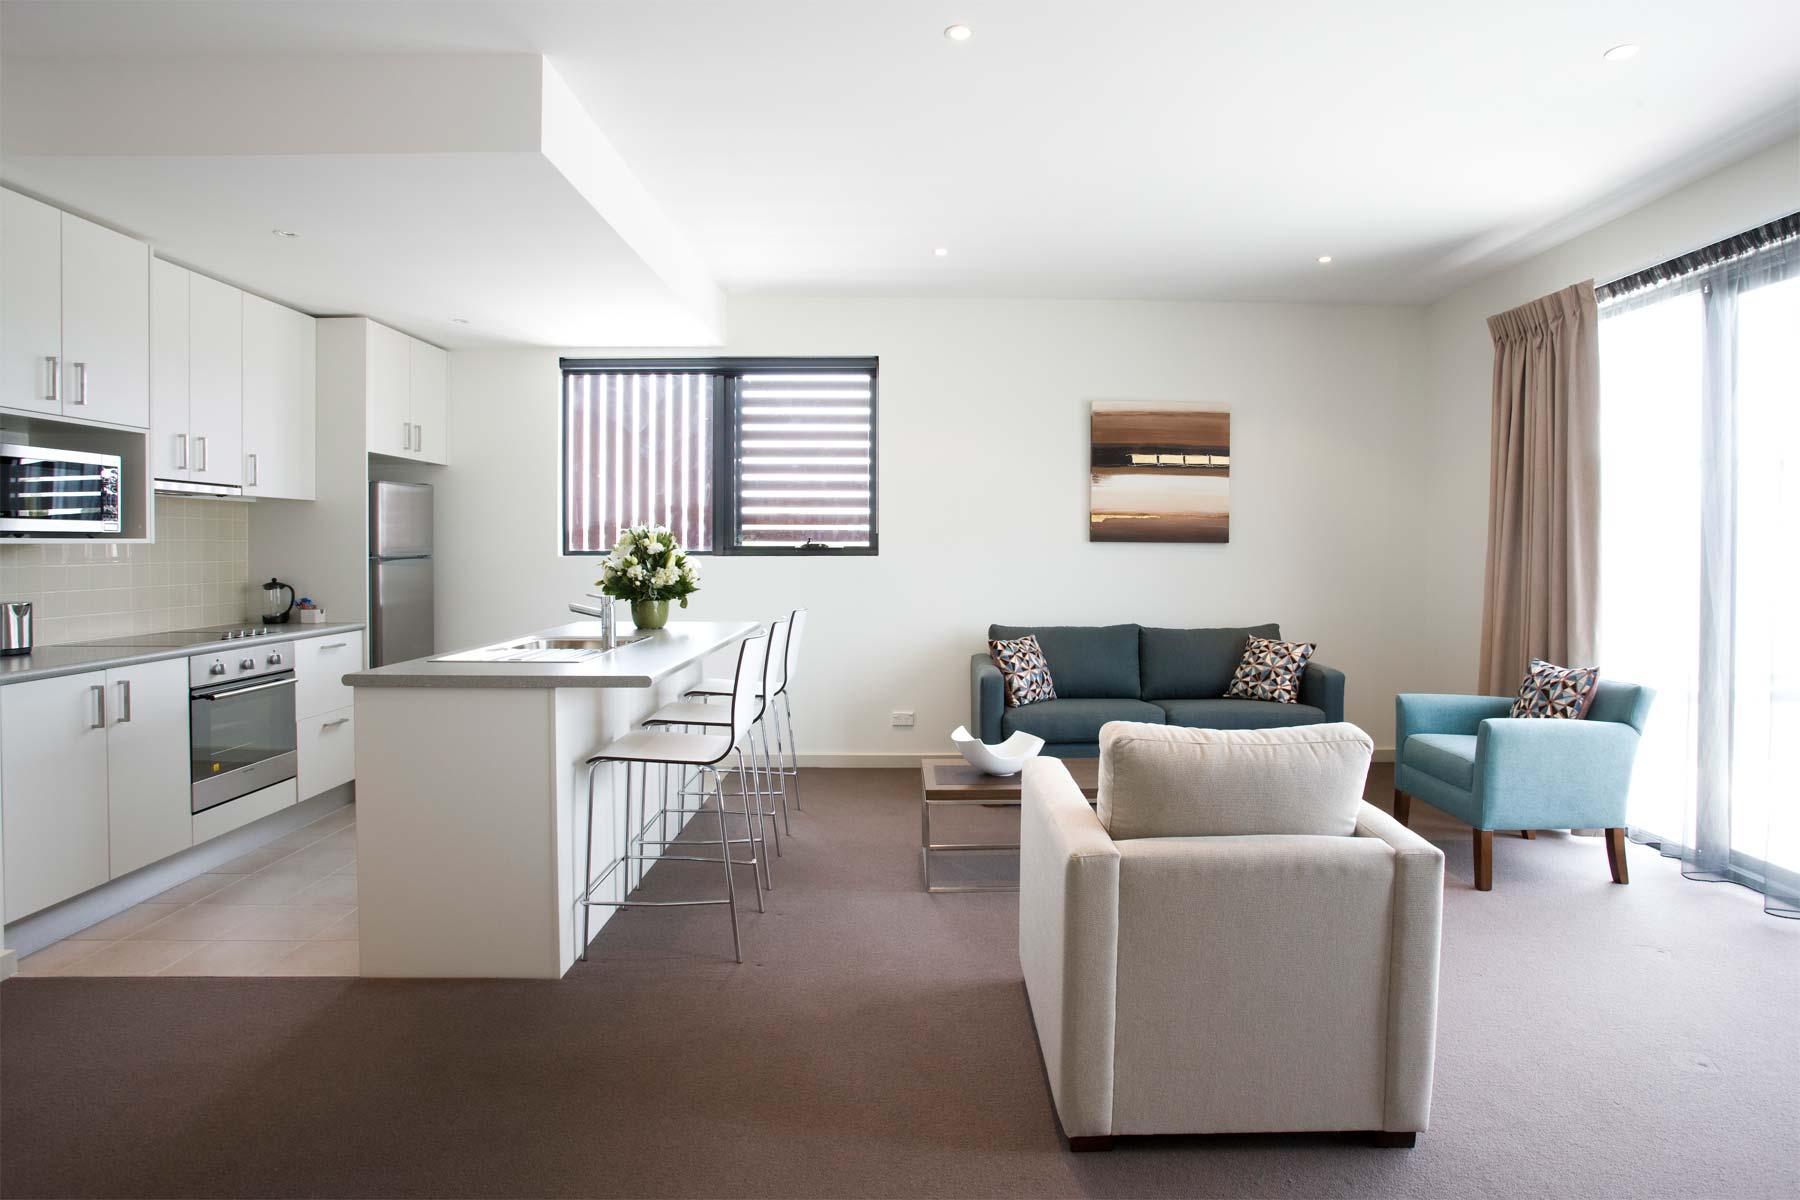 2014-Modern-Apartment-Design-Living-Room-and-Kitchen-Set